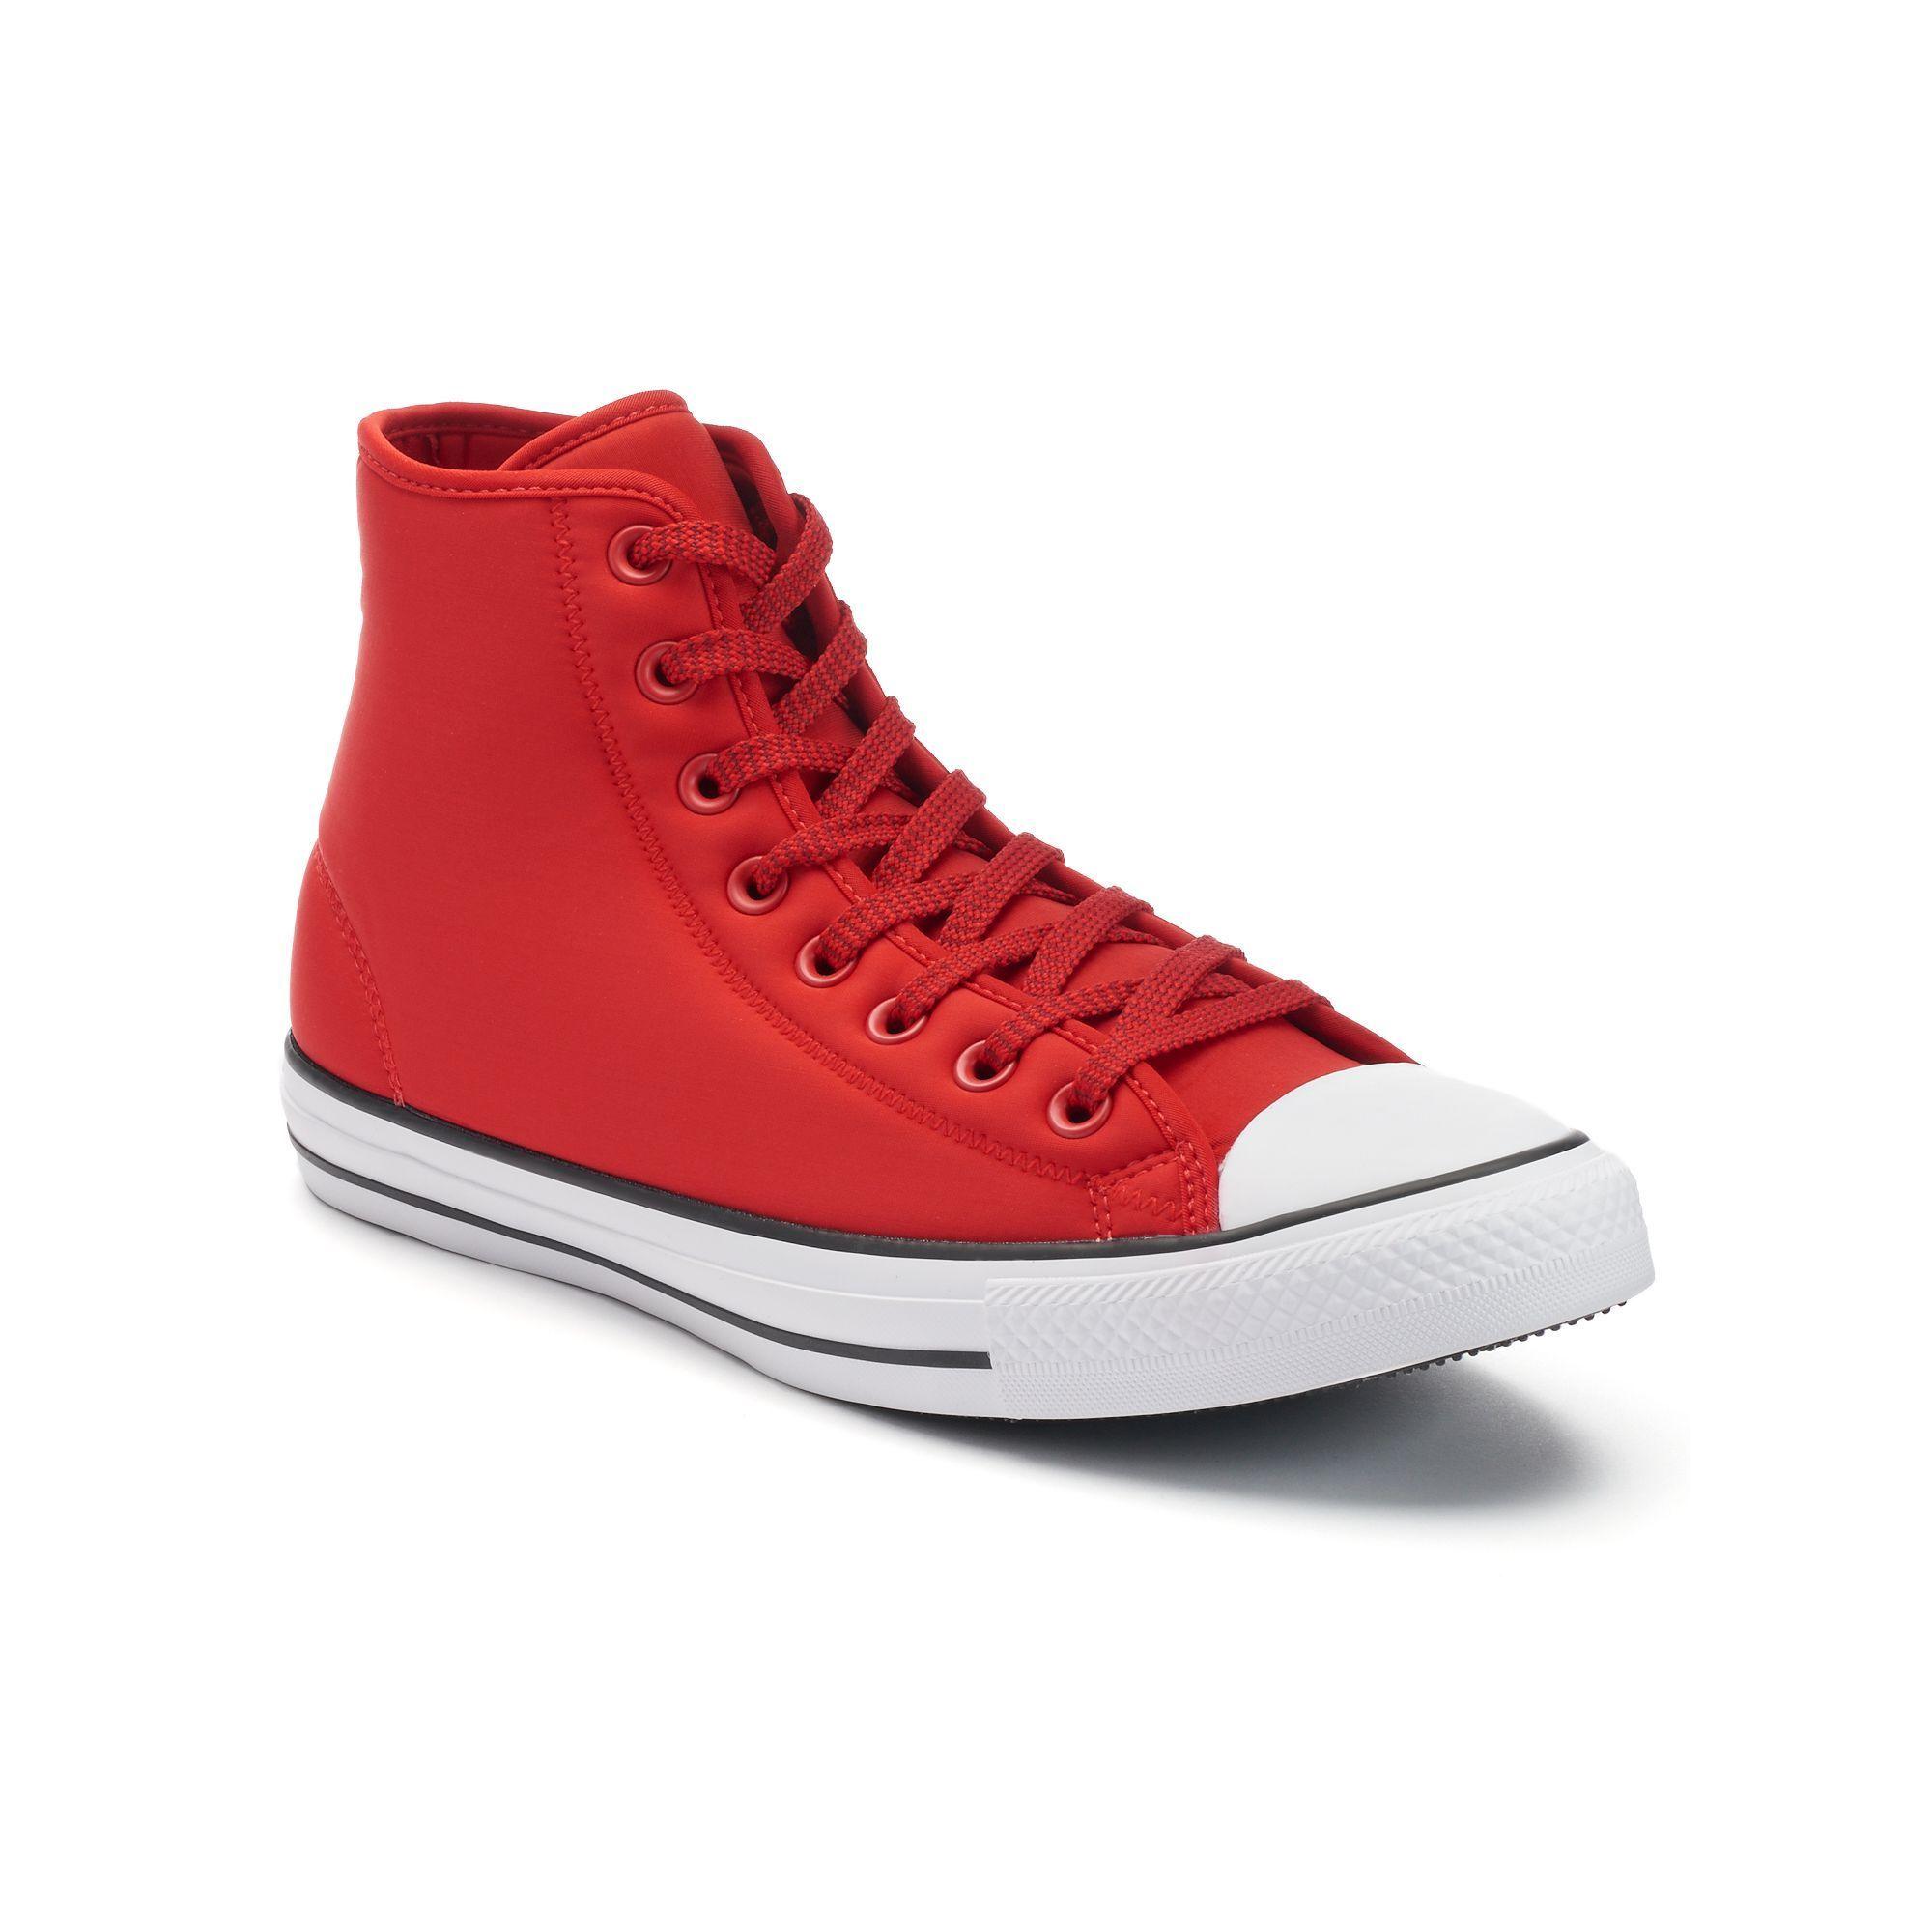 Men s Converse Chuck Taylor All Star Neoprene High-Top Sneakers ... 9d4629017